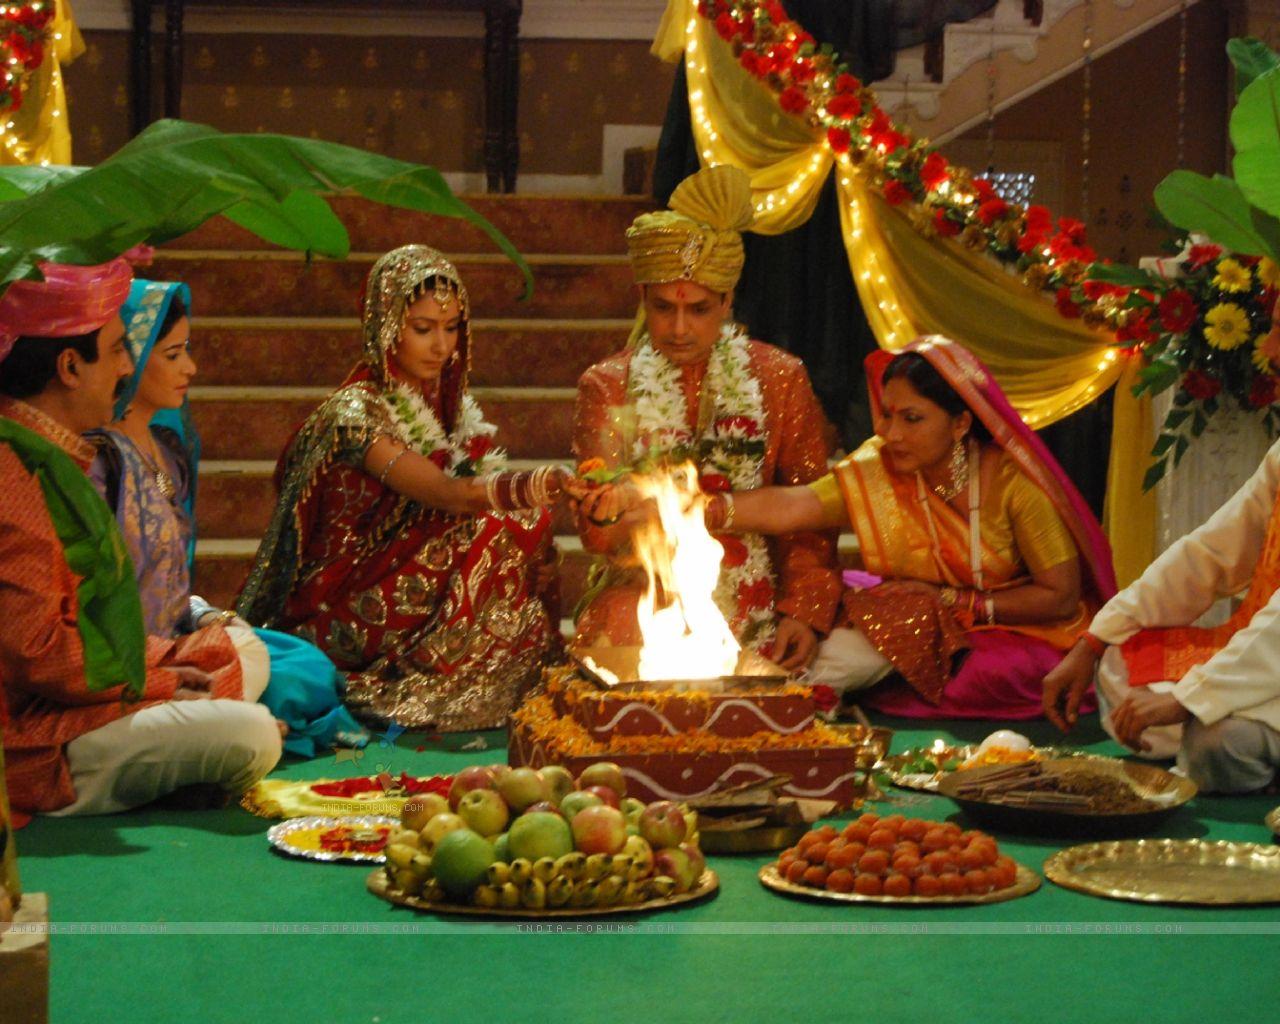 http://1.bp.blogspot.com/-oADyloUvdHk/T5A_Vhki2_I/AAAAAAAAAjo/TbZy-WIBDMY/s1600/39560-gayatri-and-naresh-wedding-ceremony.jpg